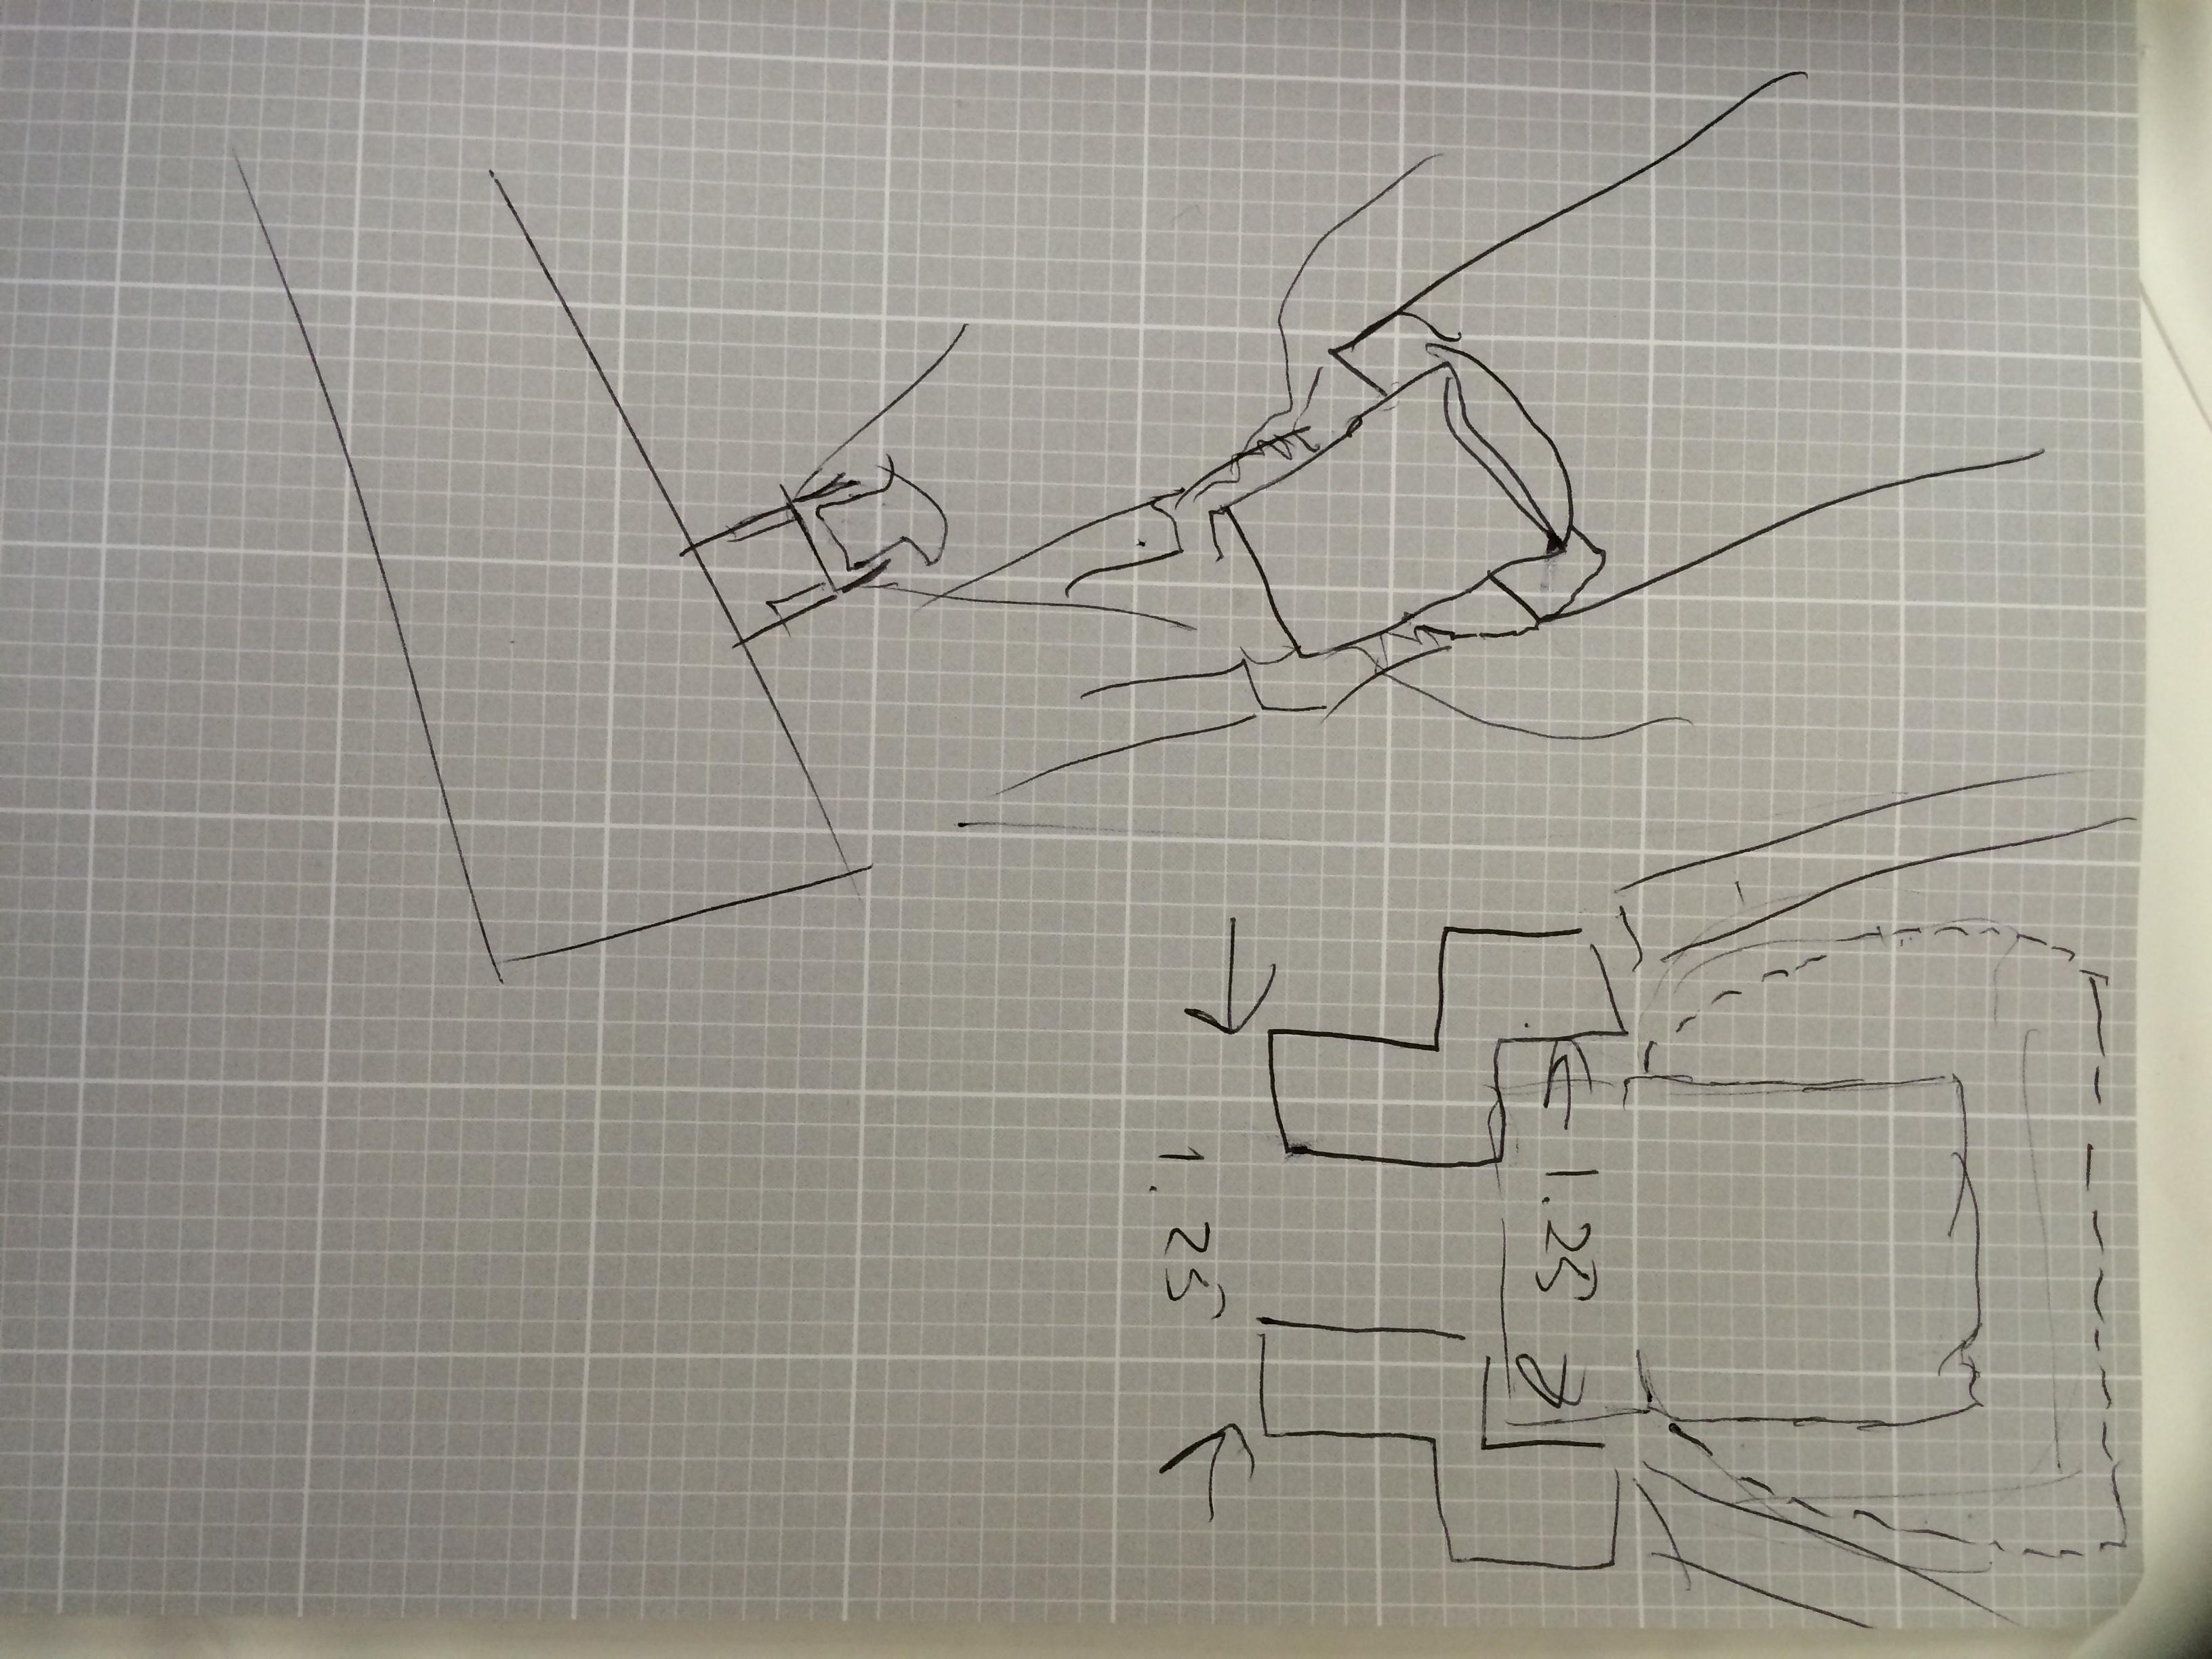 sunfunl-sketch.jpg